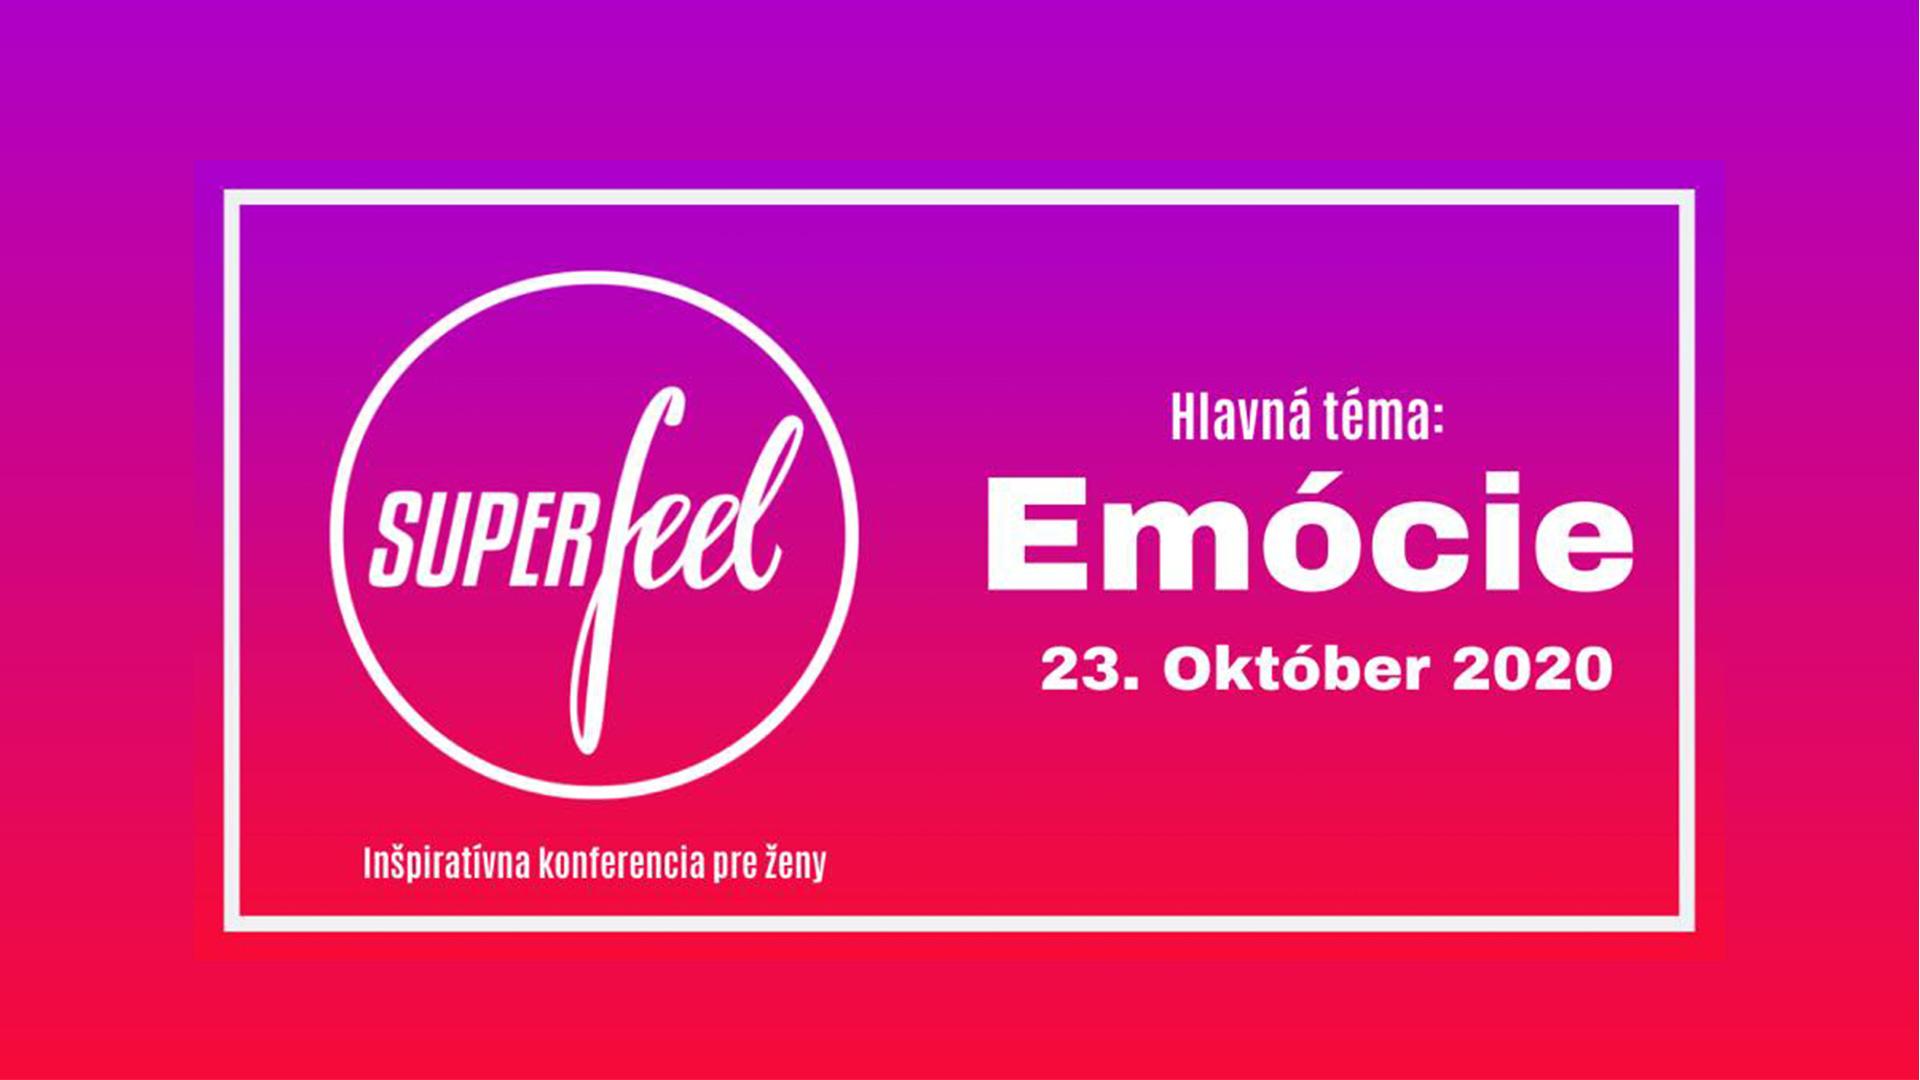 superfeel-konferencia-2020_tema-emocie